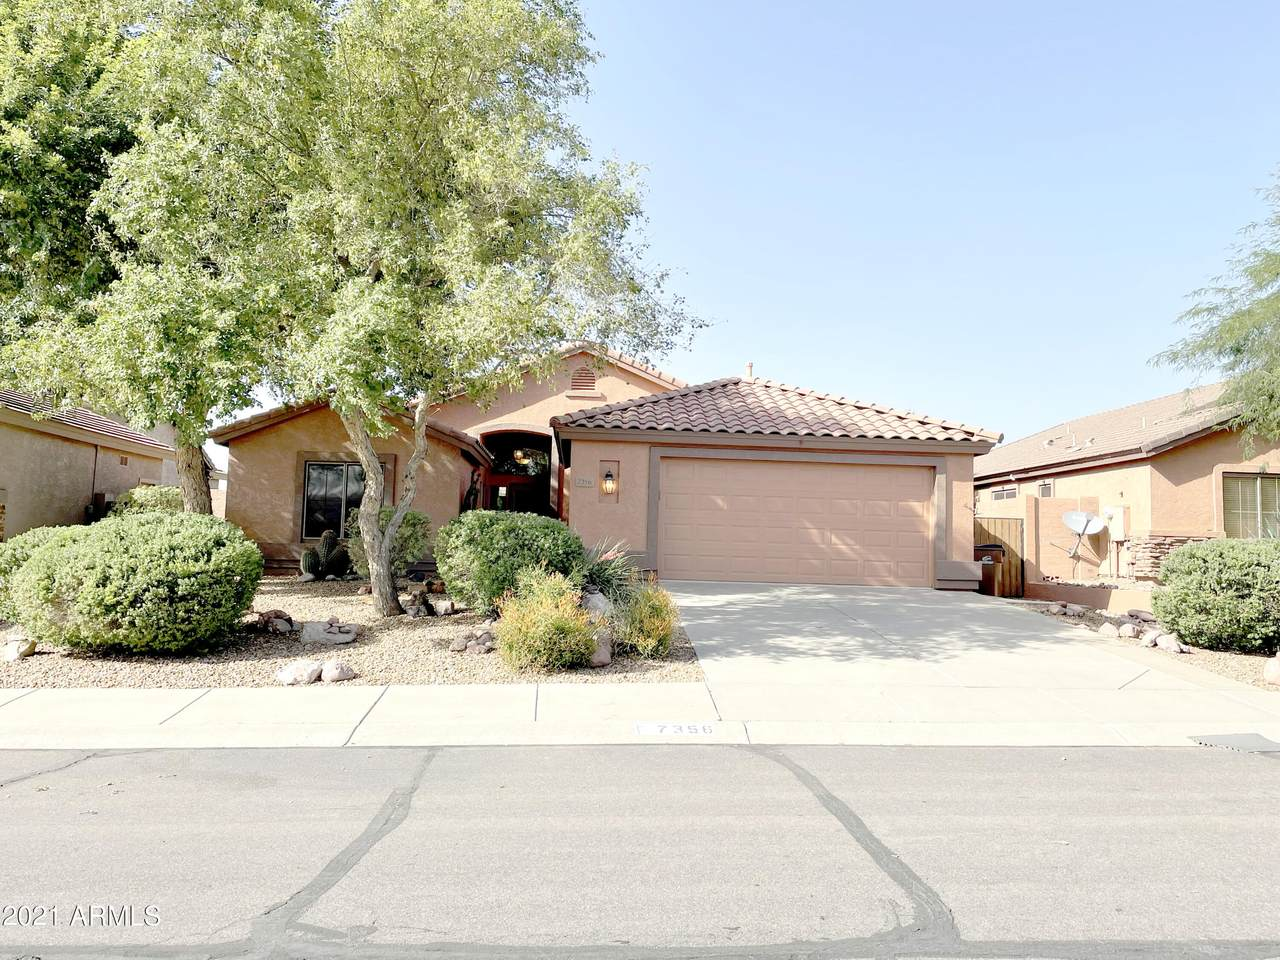 7356 Desert Honeysuckle Drive - Photo 1